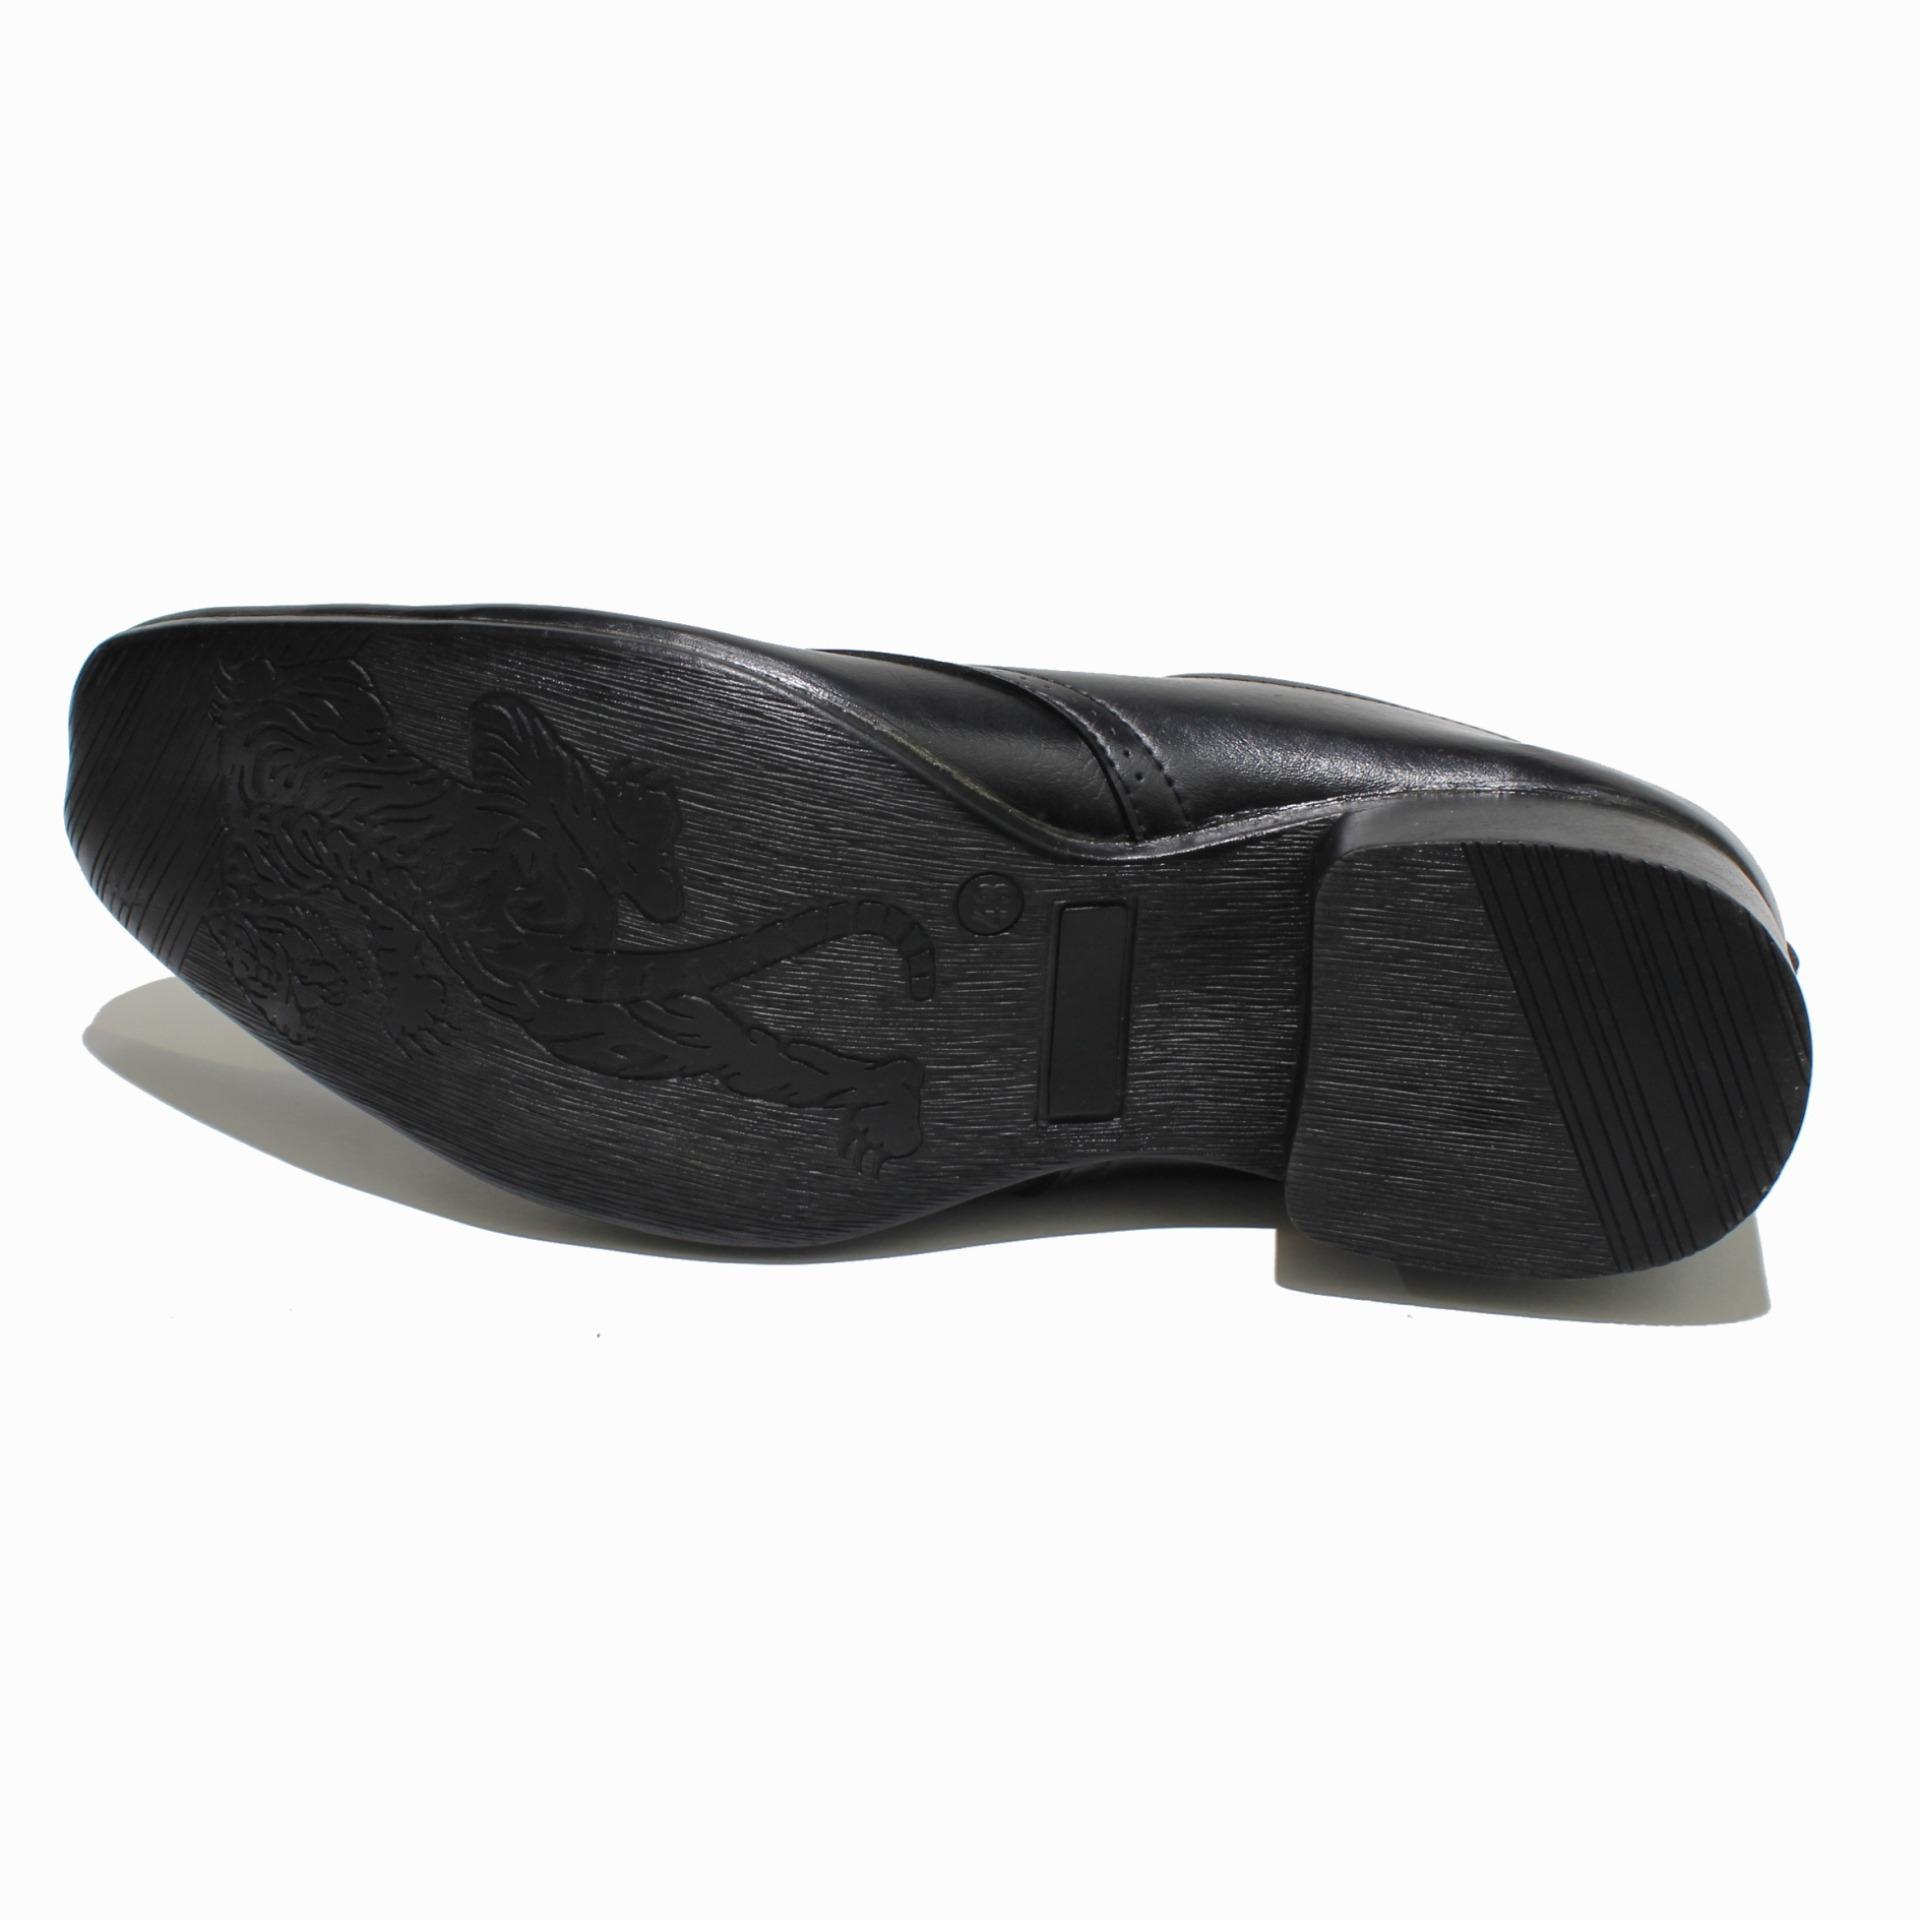 Skytop Sepatu Pantofel Karet Kerja Formal Fashion Hitam Bsm Soga 275 Boots Pria Kulit Asli Elegan Roffael A3